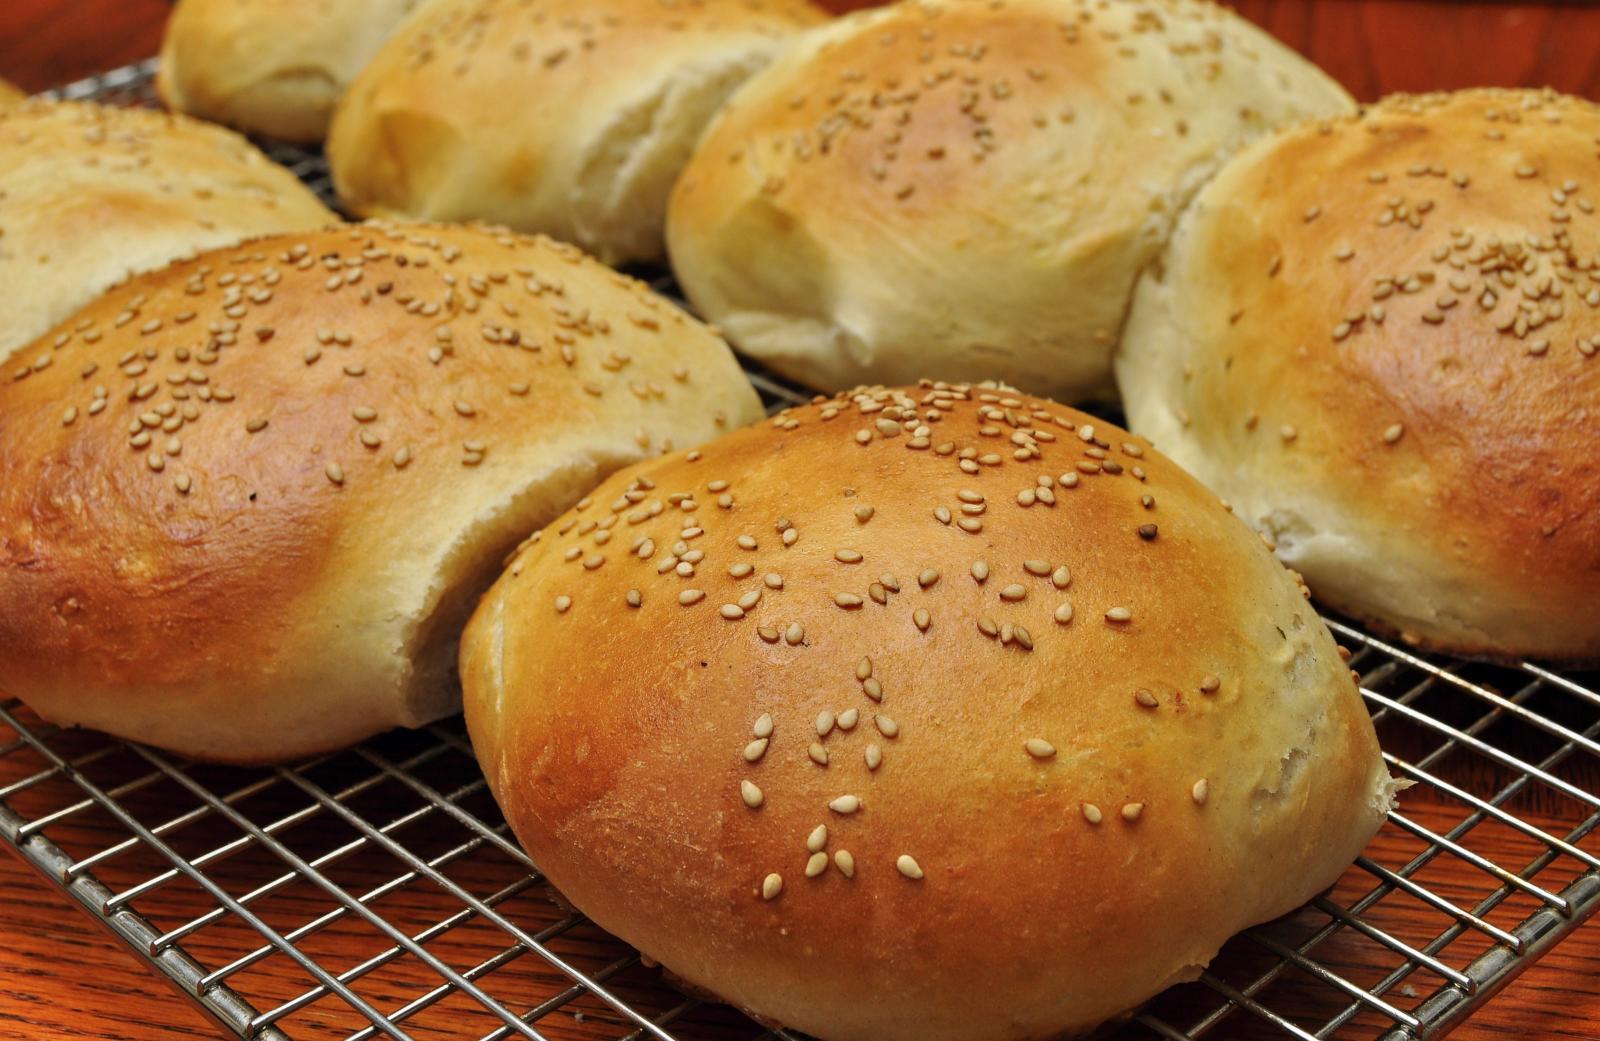 File:Sesame seed hamburger buns.jpg - Wikimedia Commons